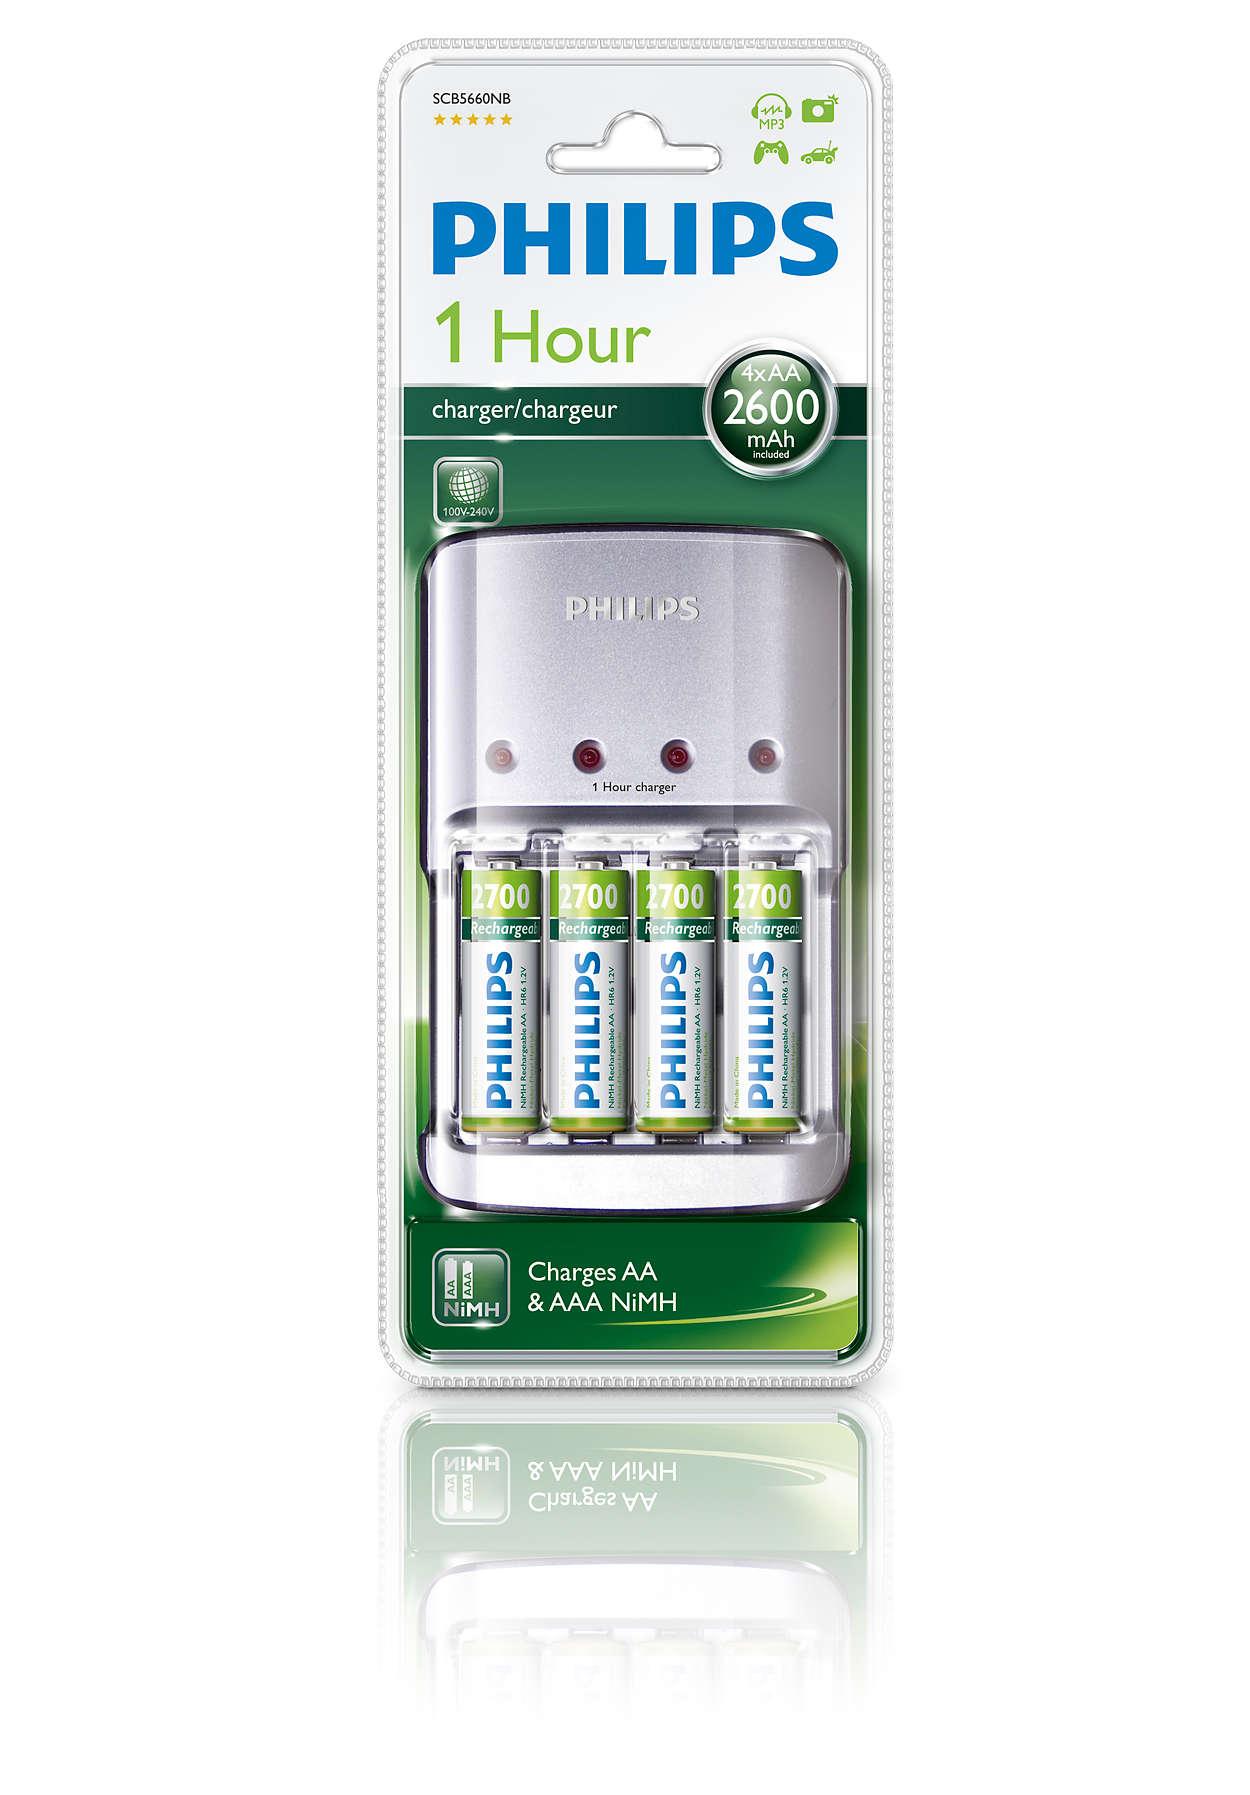 Полная зарядка 2—4 аккумуляторов типа AA/AAA за 1час